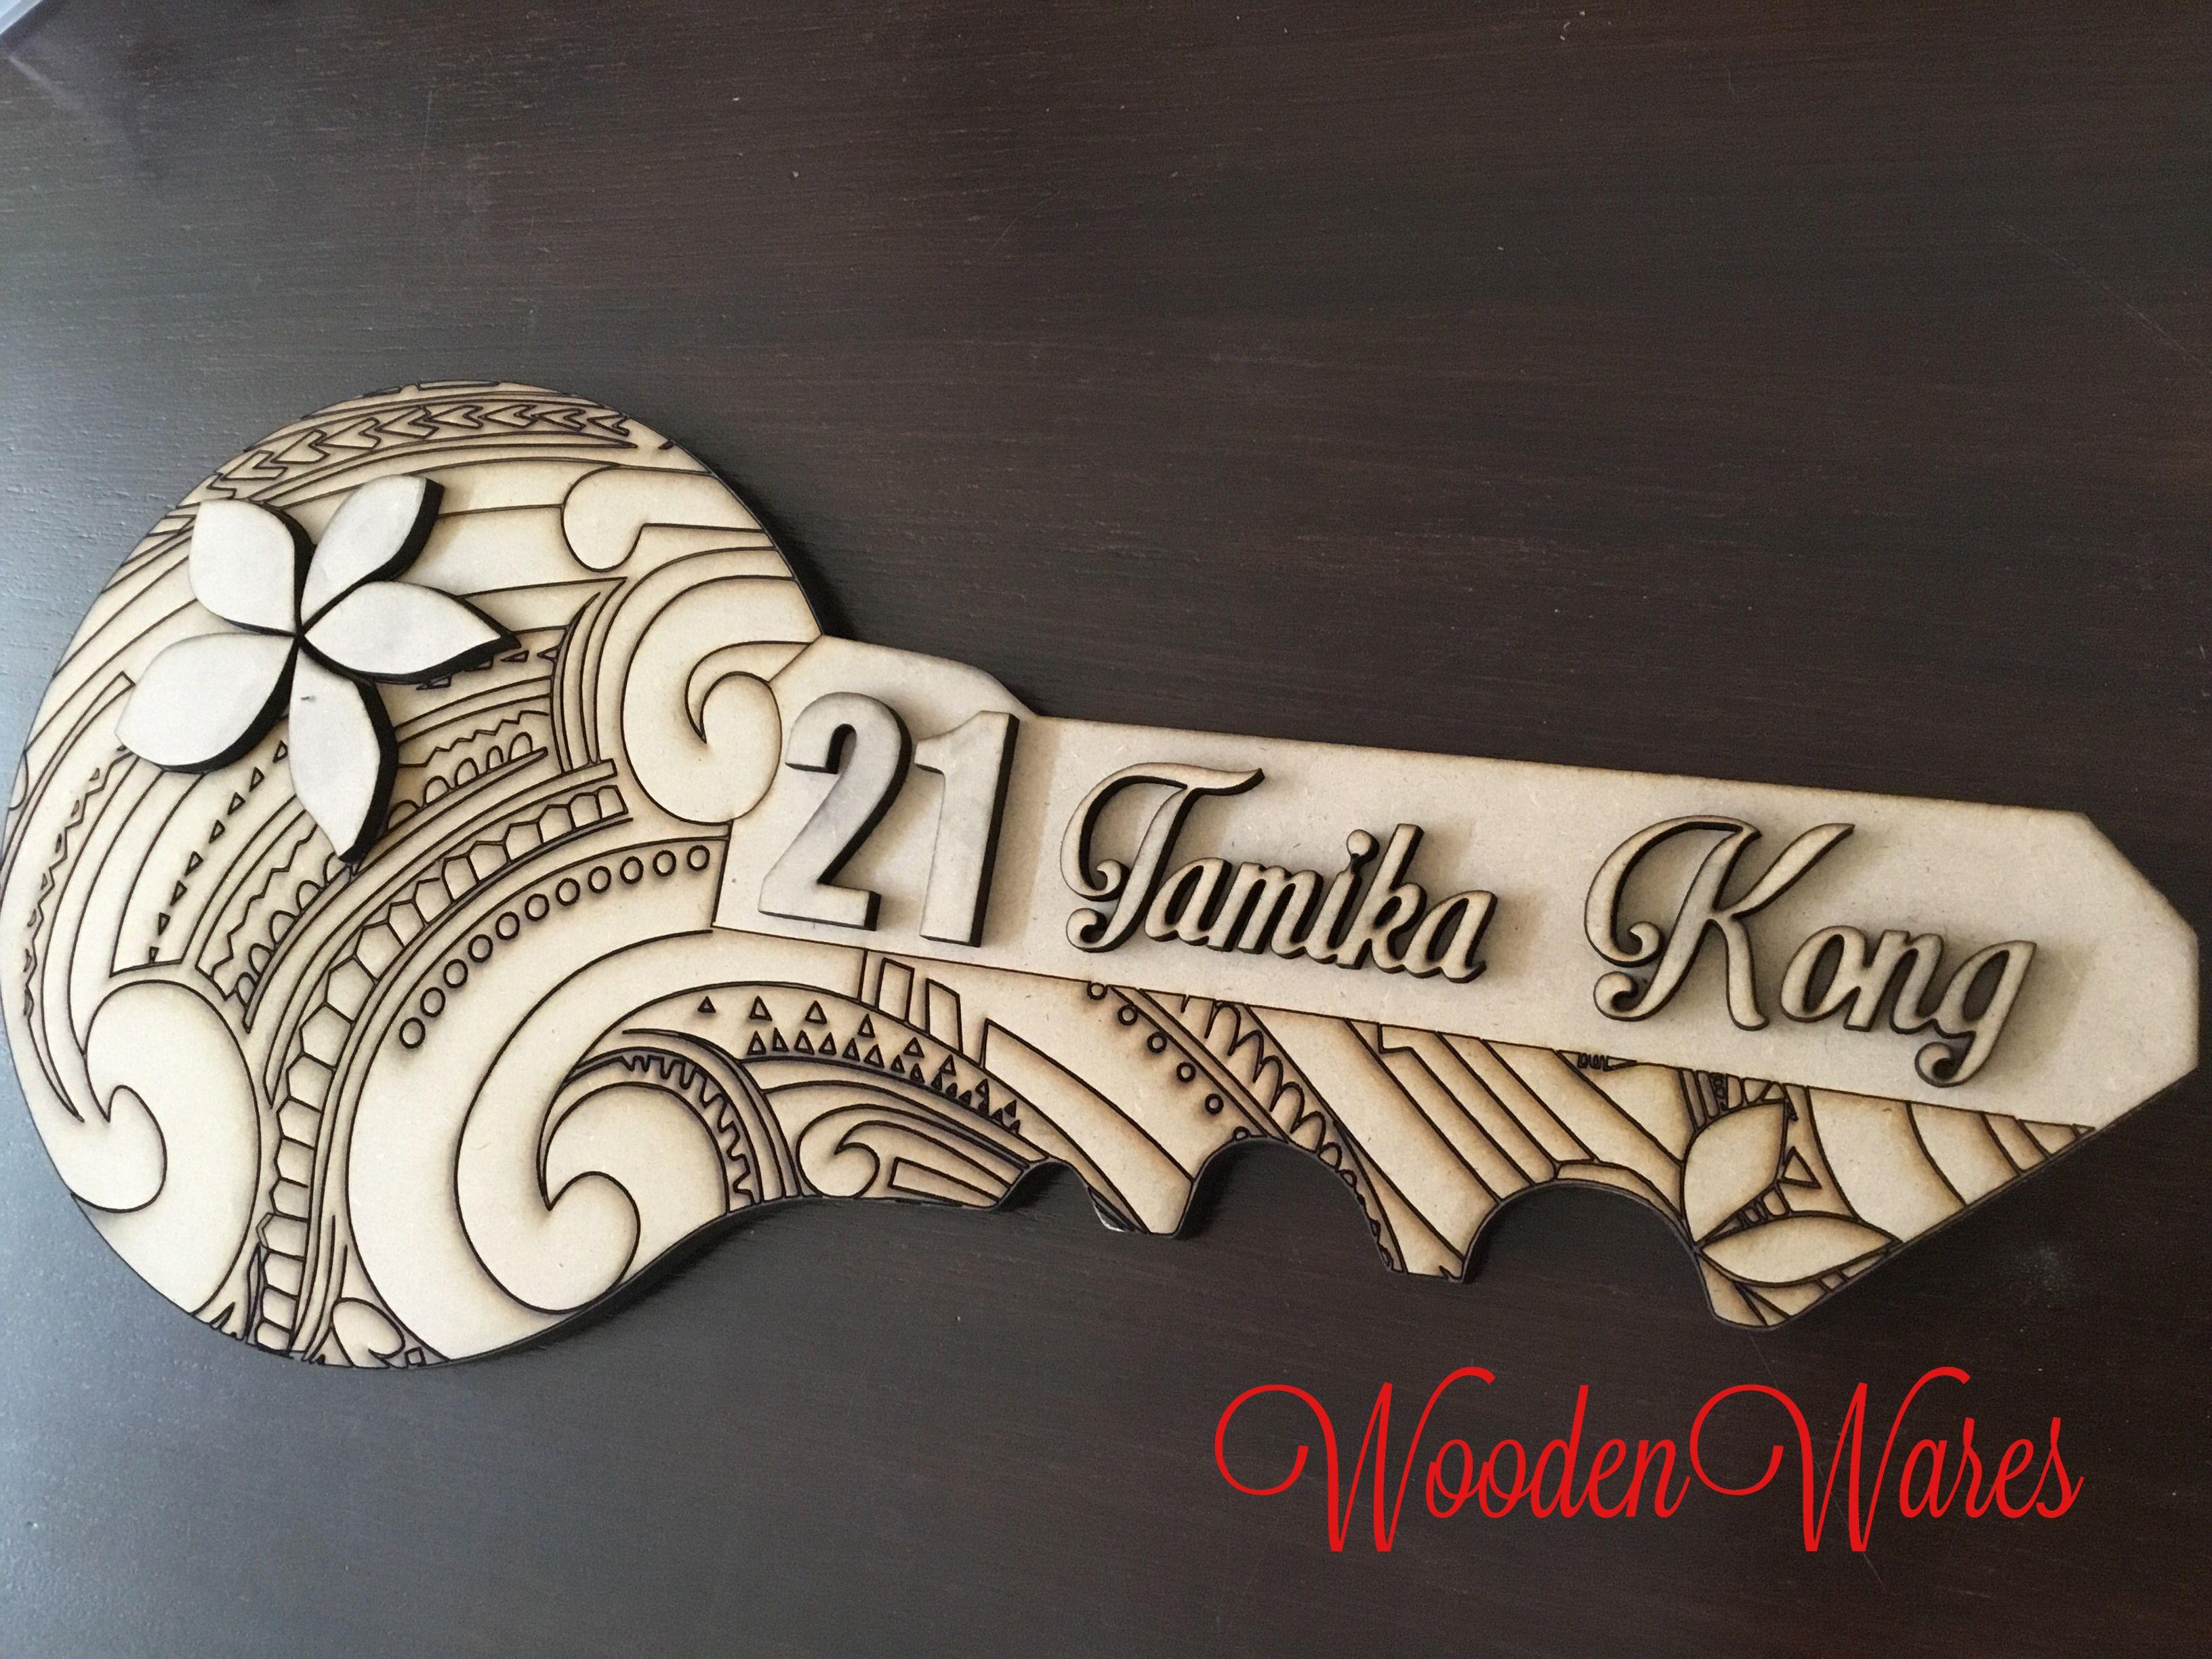 21st Tattoo Birthday Key - WoodenWares.com.au Brisbane Australia mdf craft wood